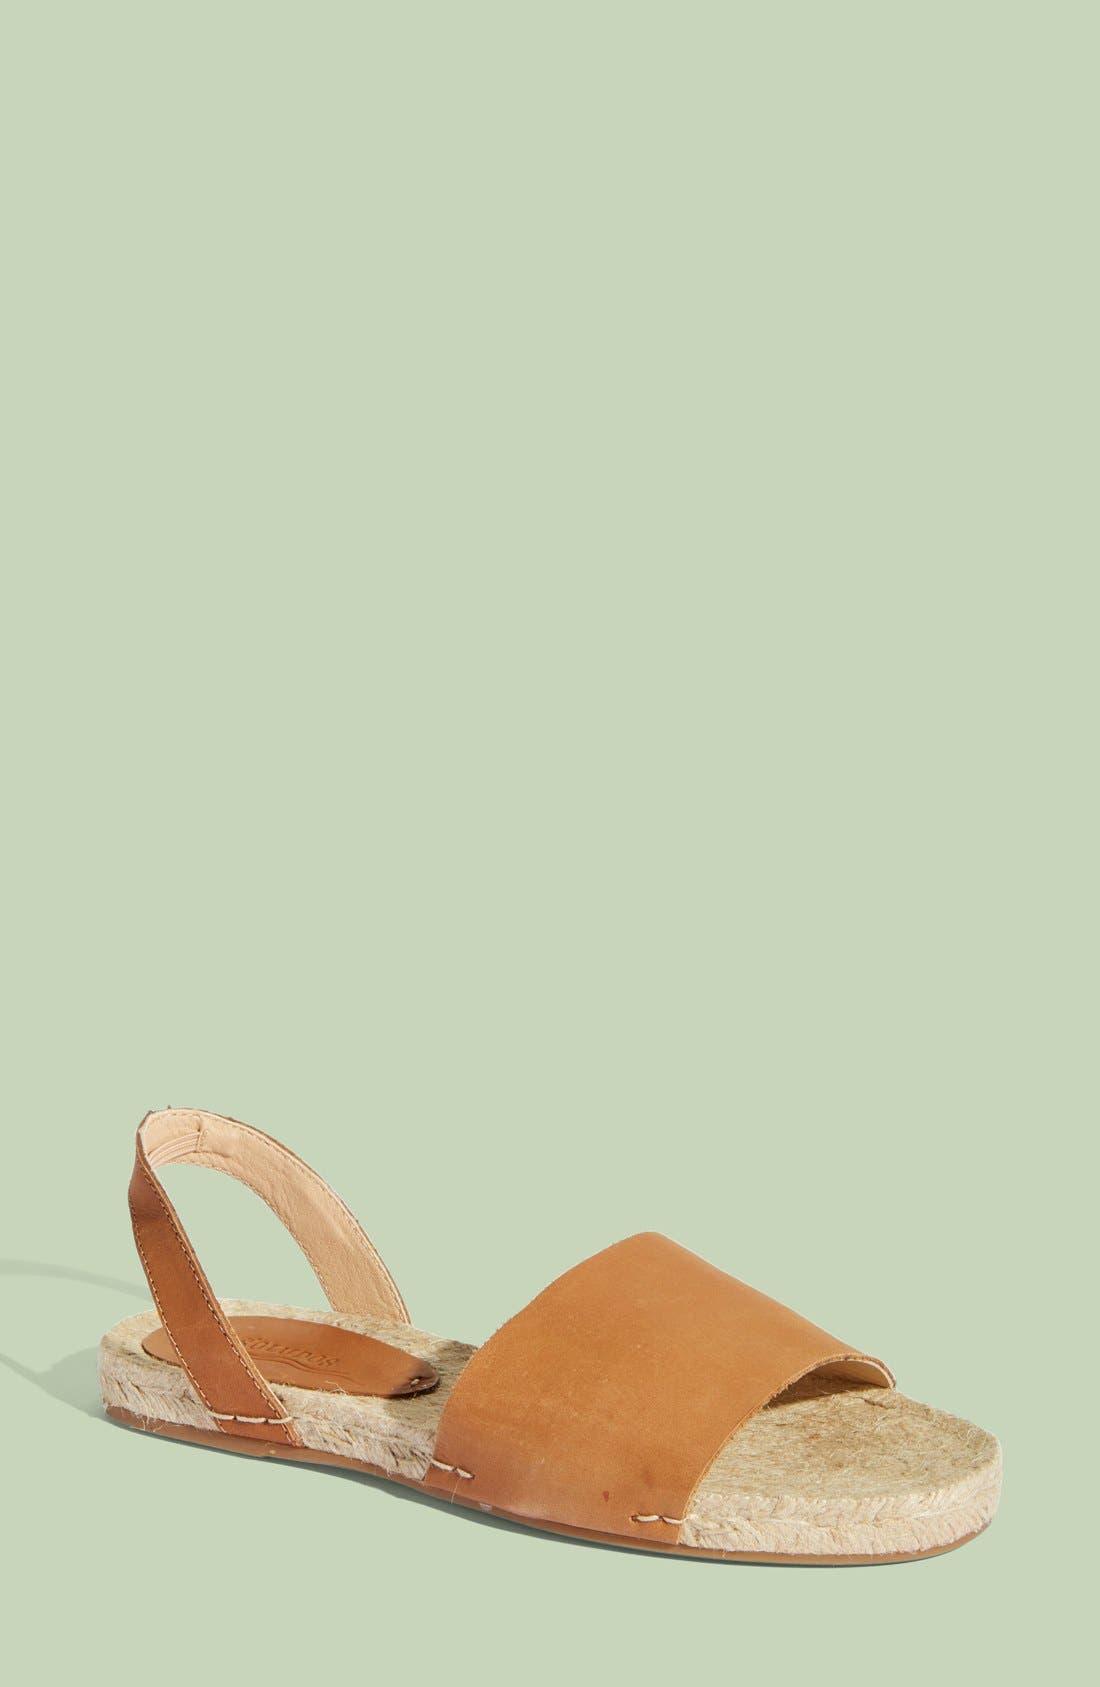 SOLUDOS, Slingback Sandal, Main thumbnail 1, color, 211